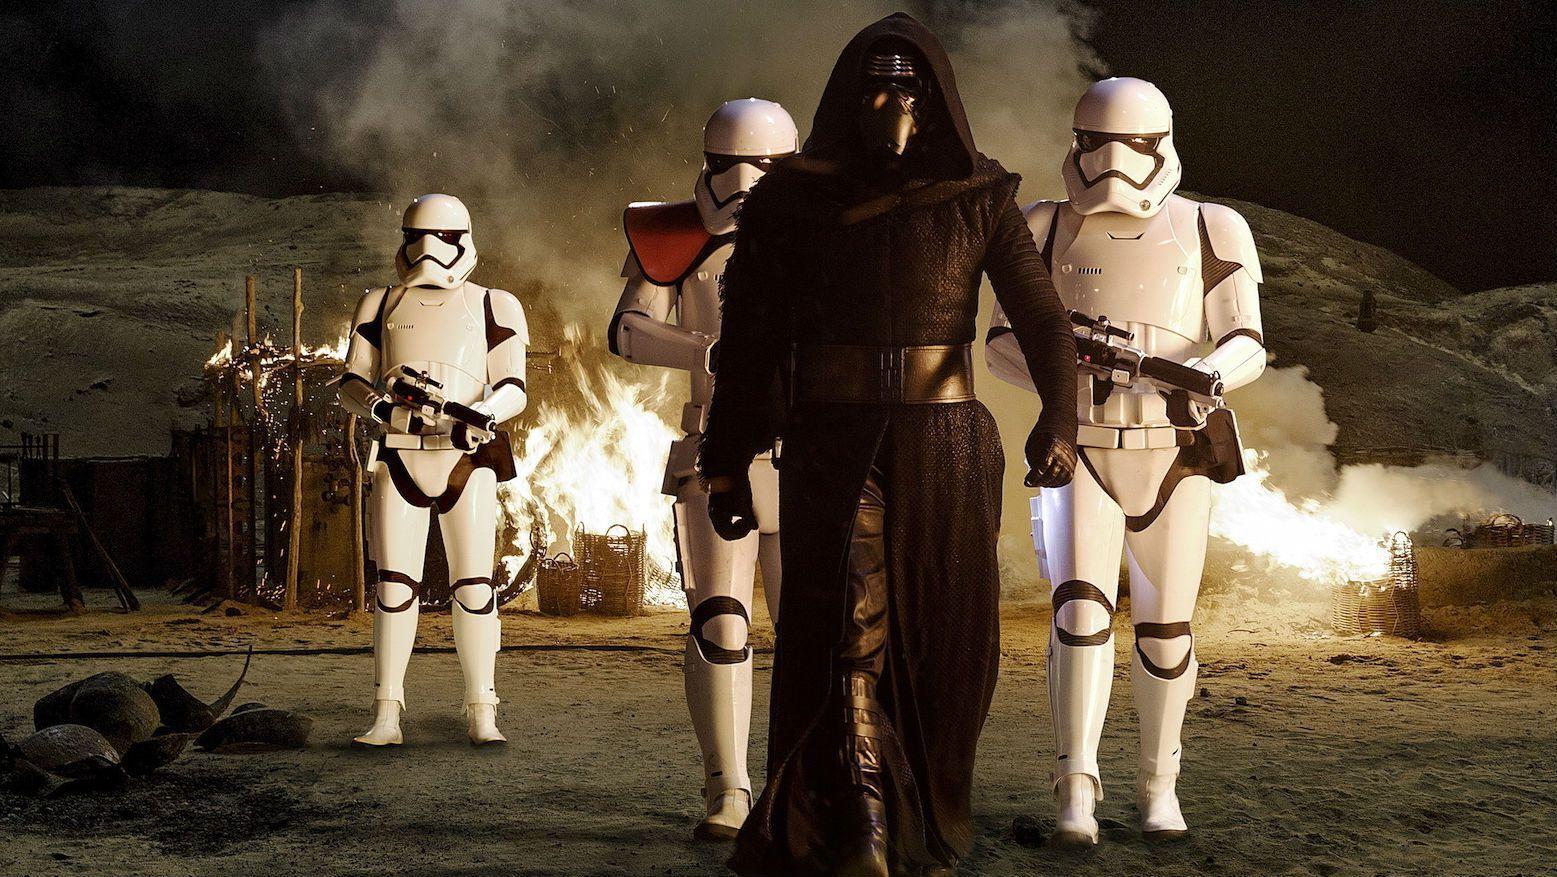 Screenshot from Star Wars: The Force Awakens